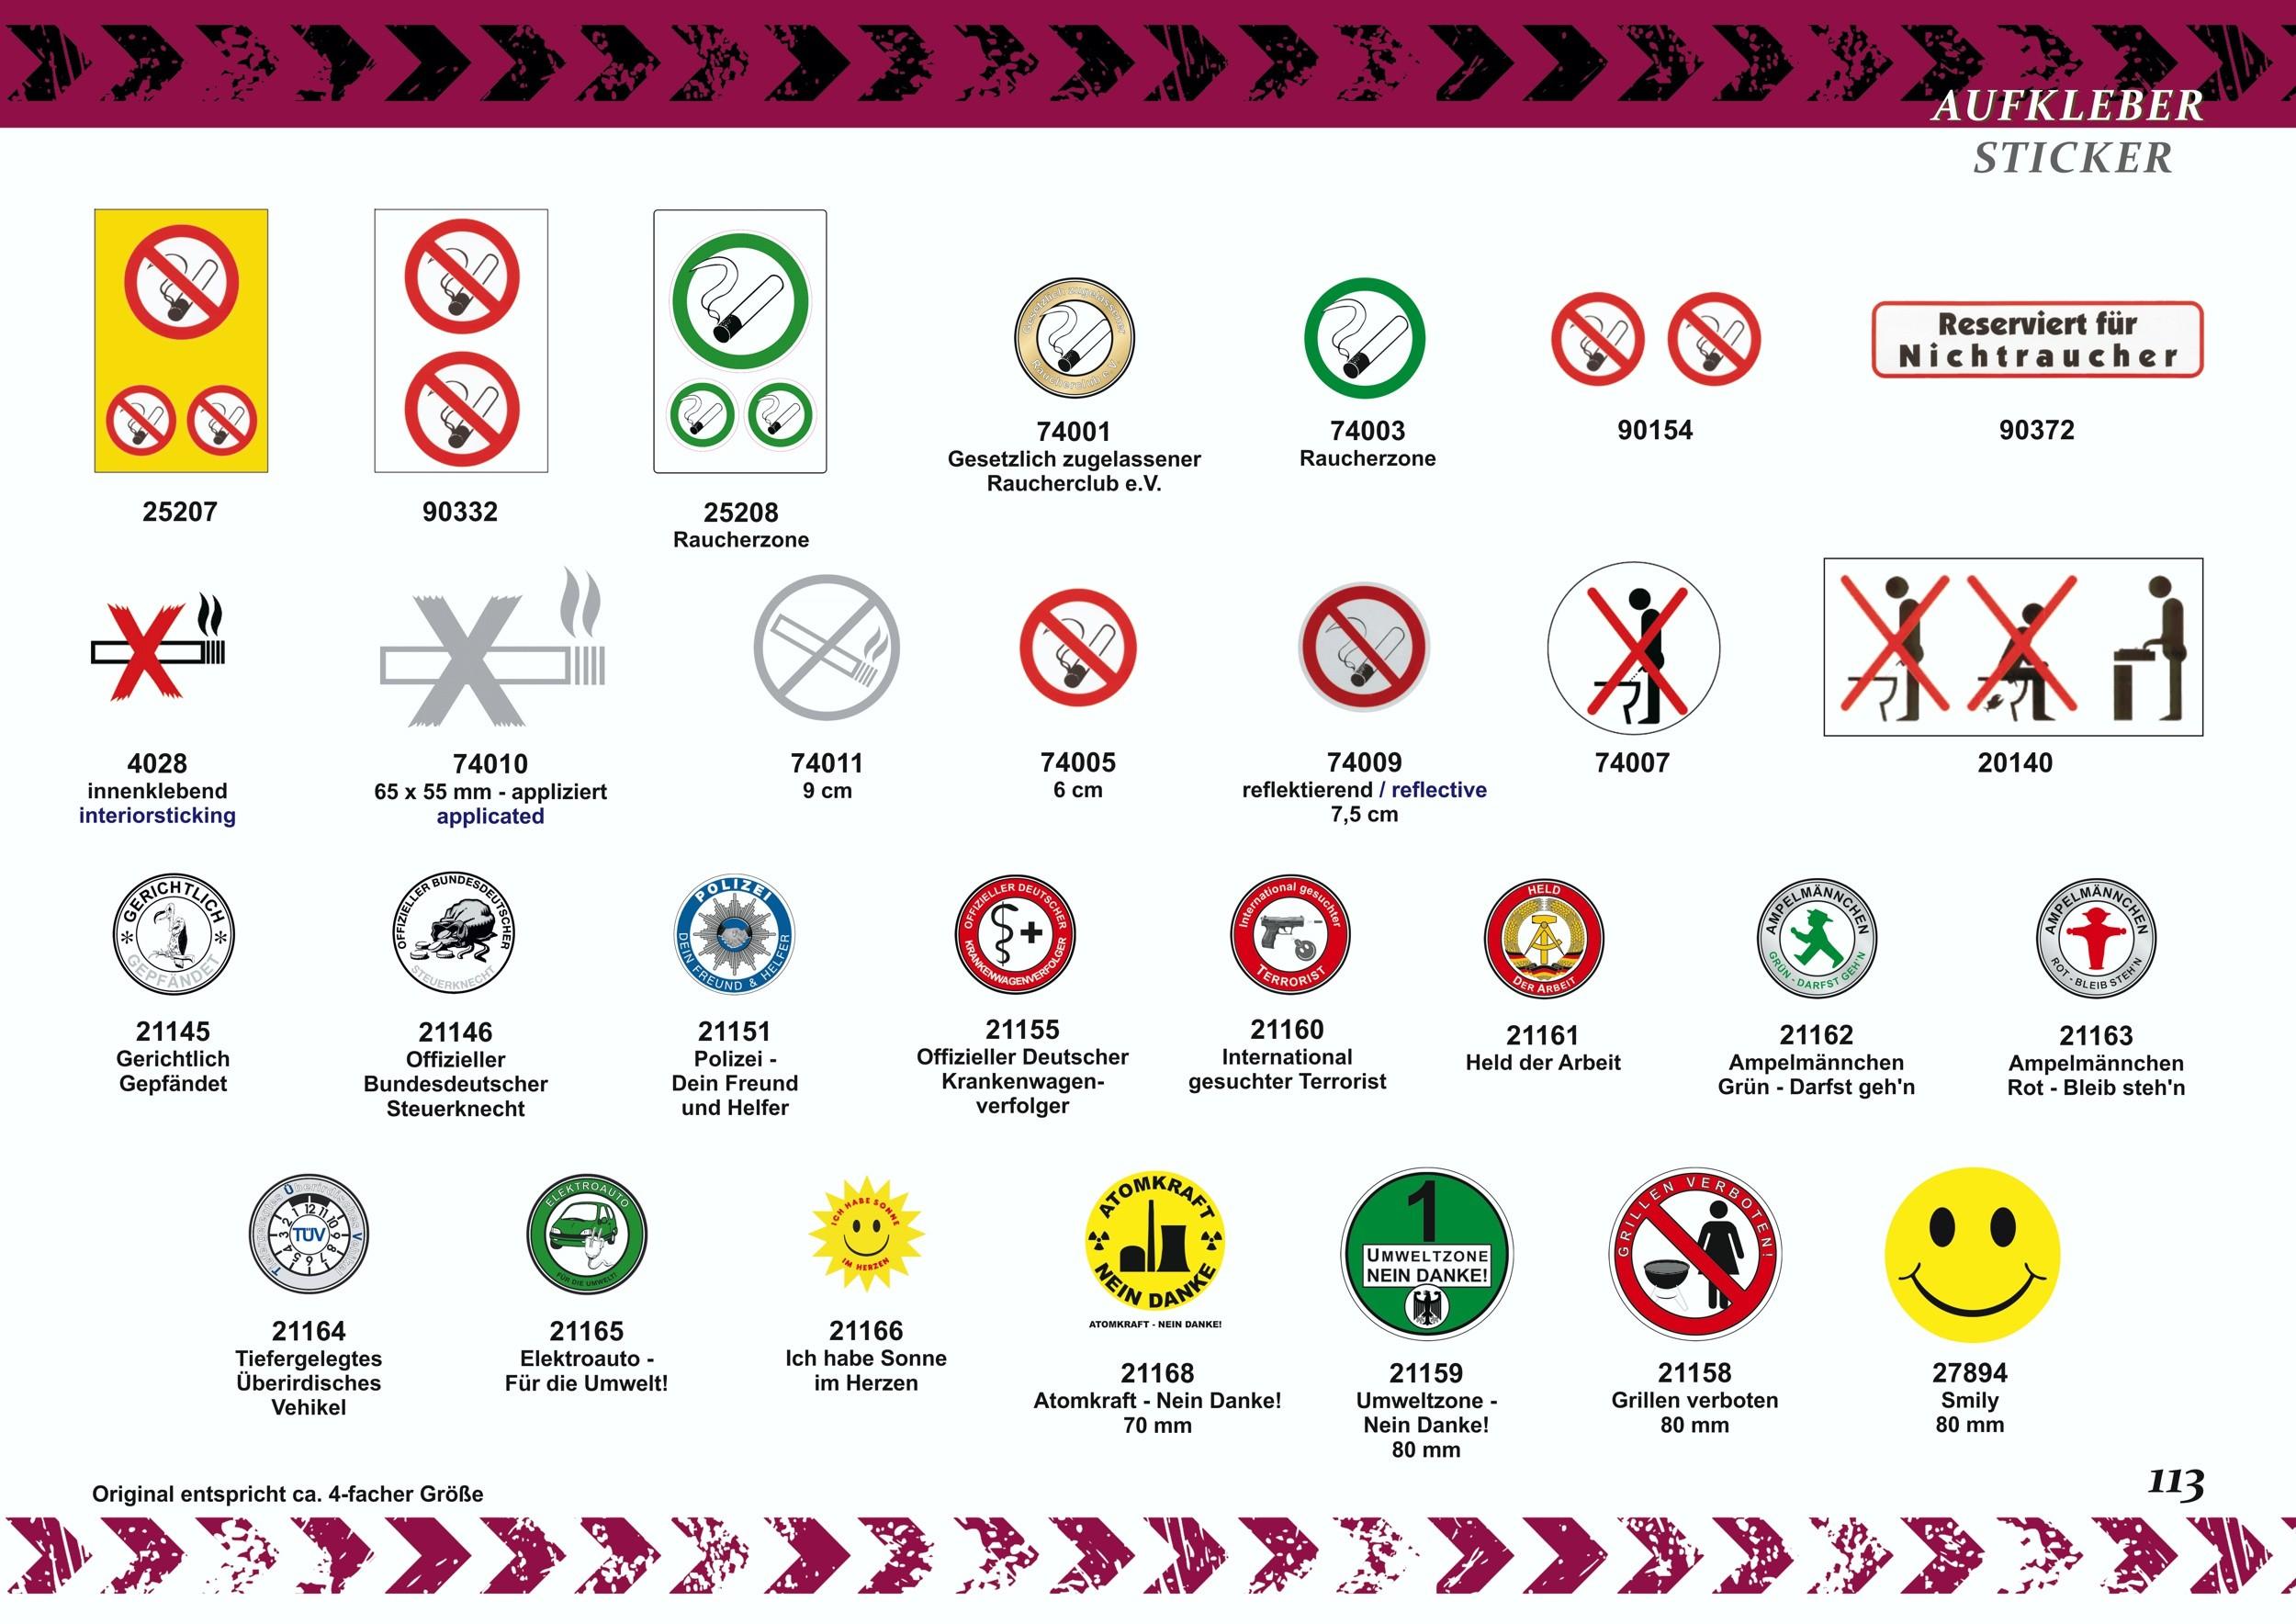 Sticker Auto-Alarm interiorsticking – Bild 6